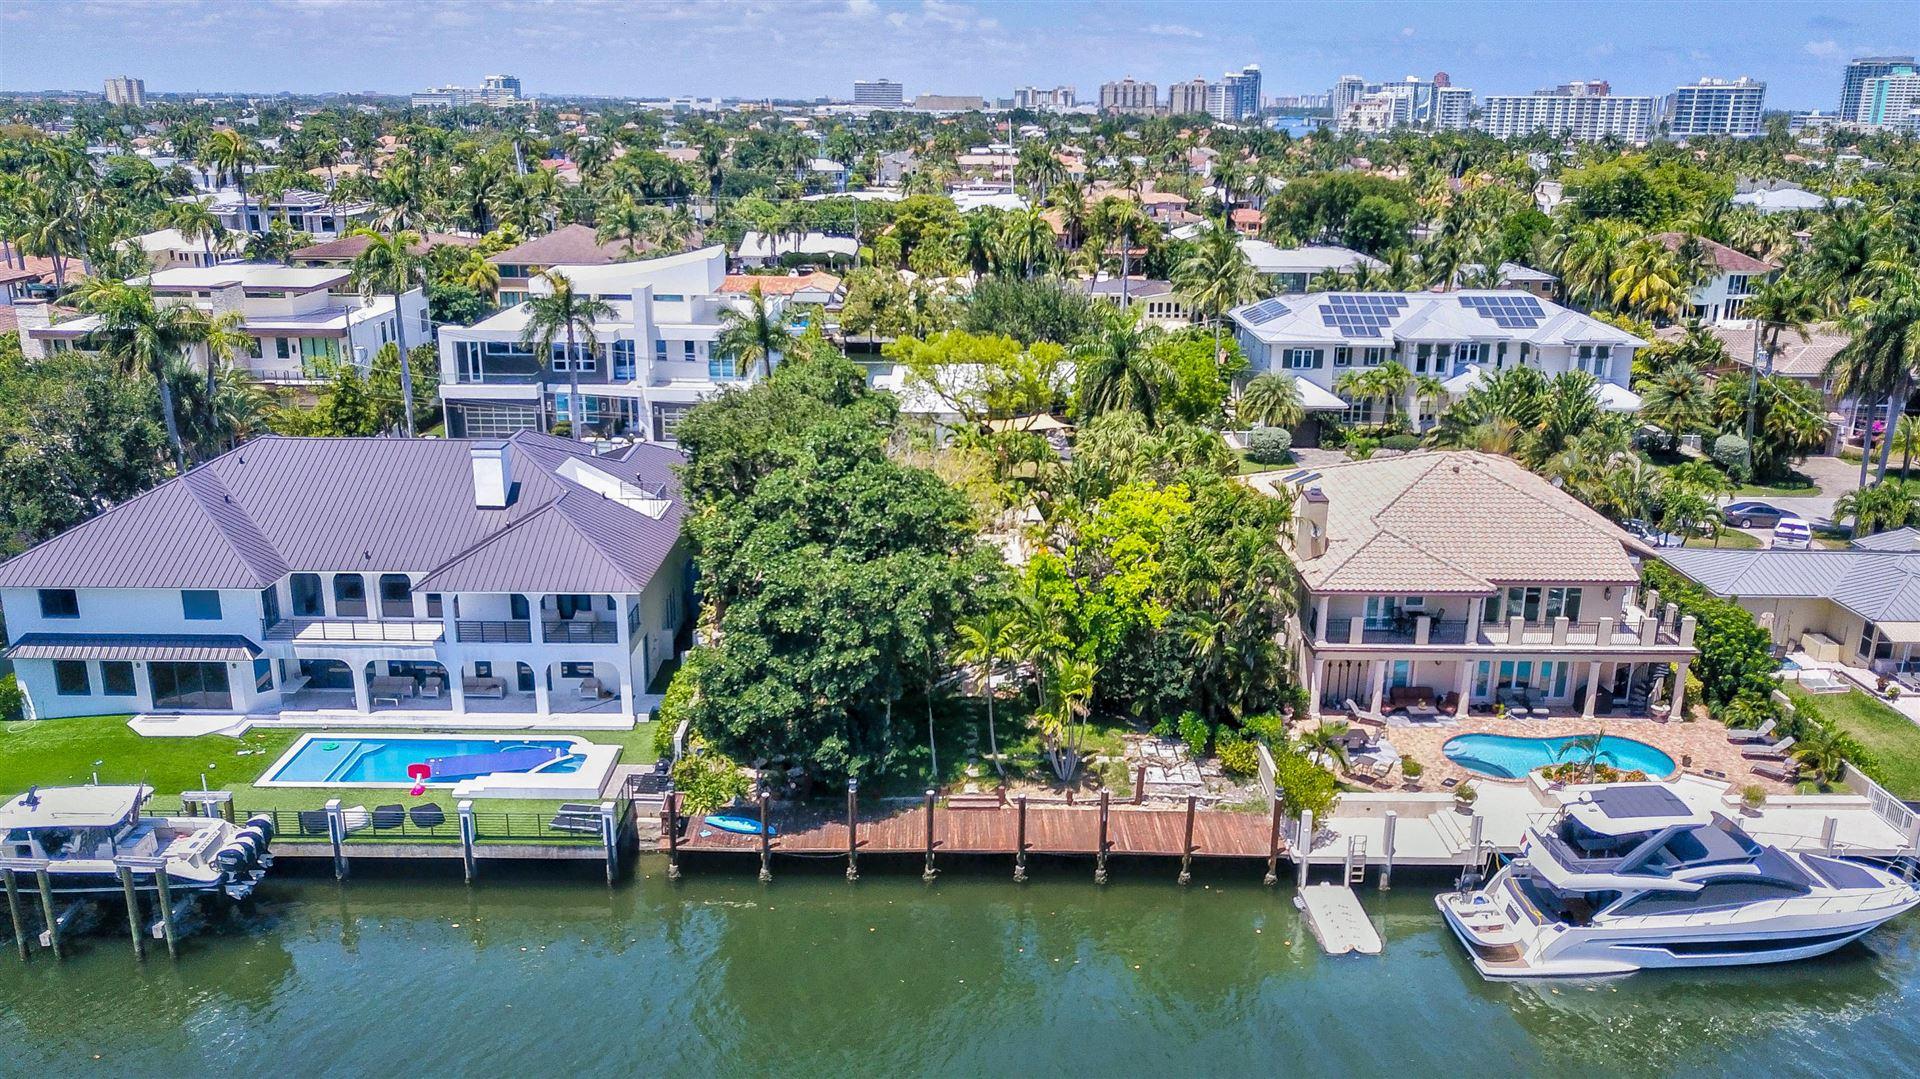 2508 Delmar Place, Fort Lauderdale, FL 33301 - MLS#: RX-10711892